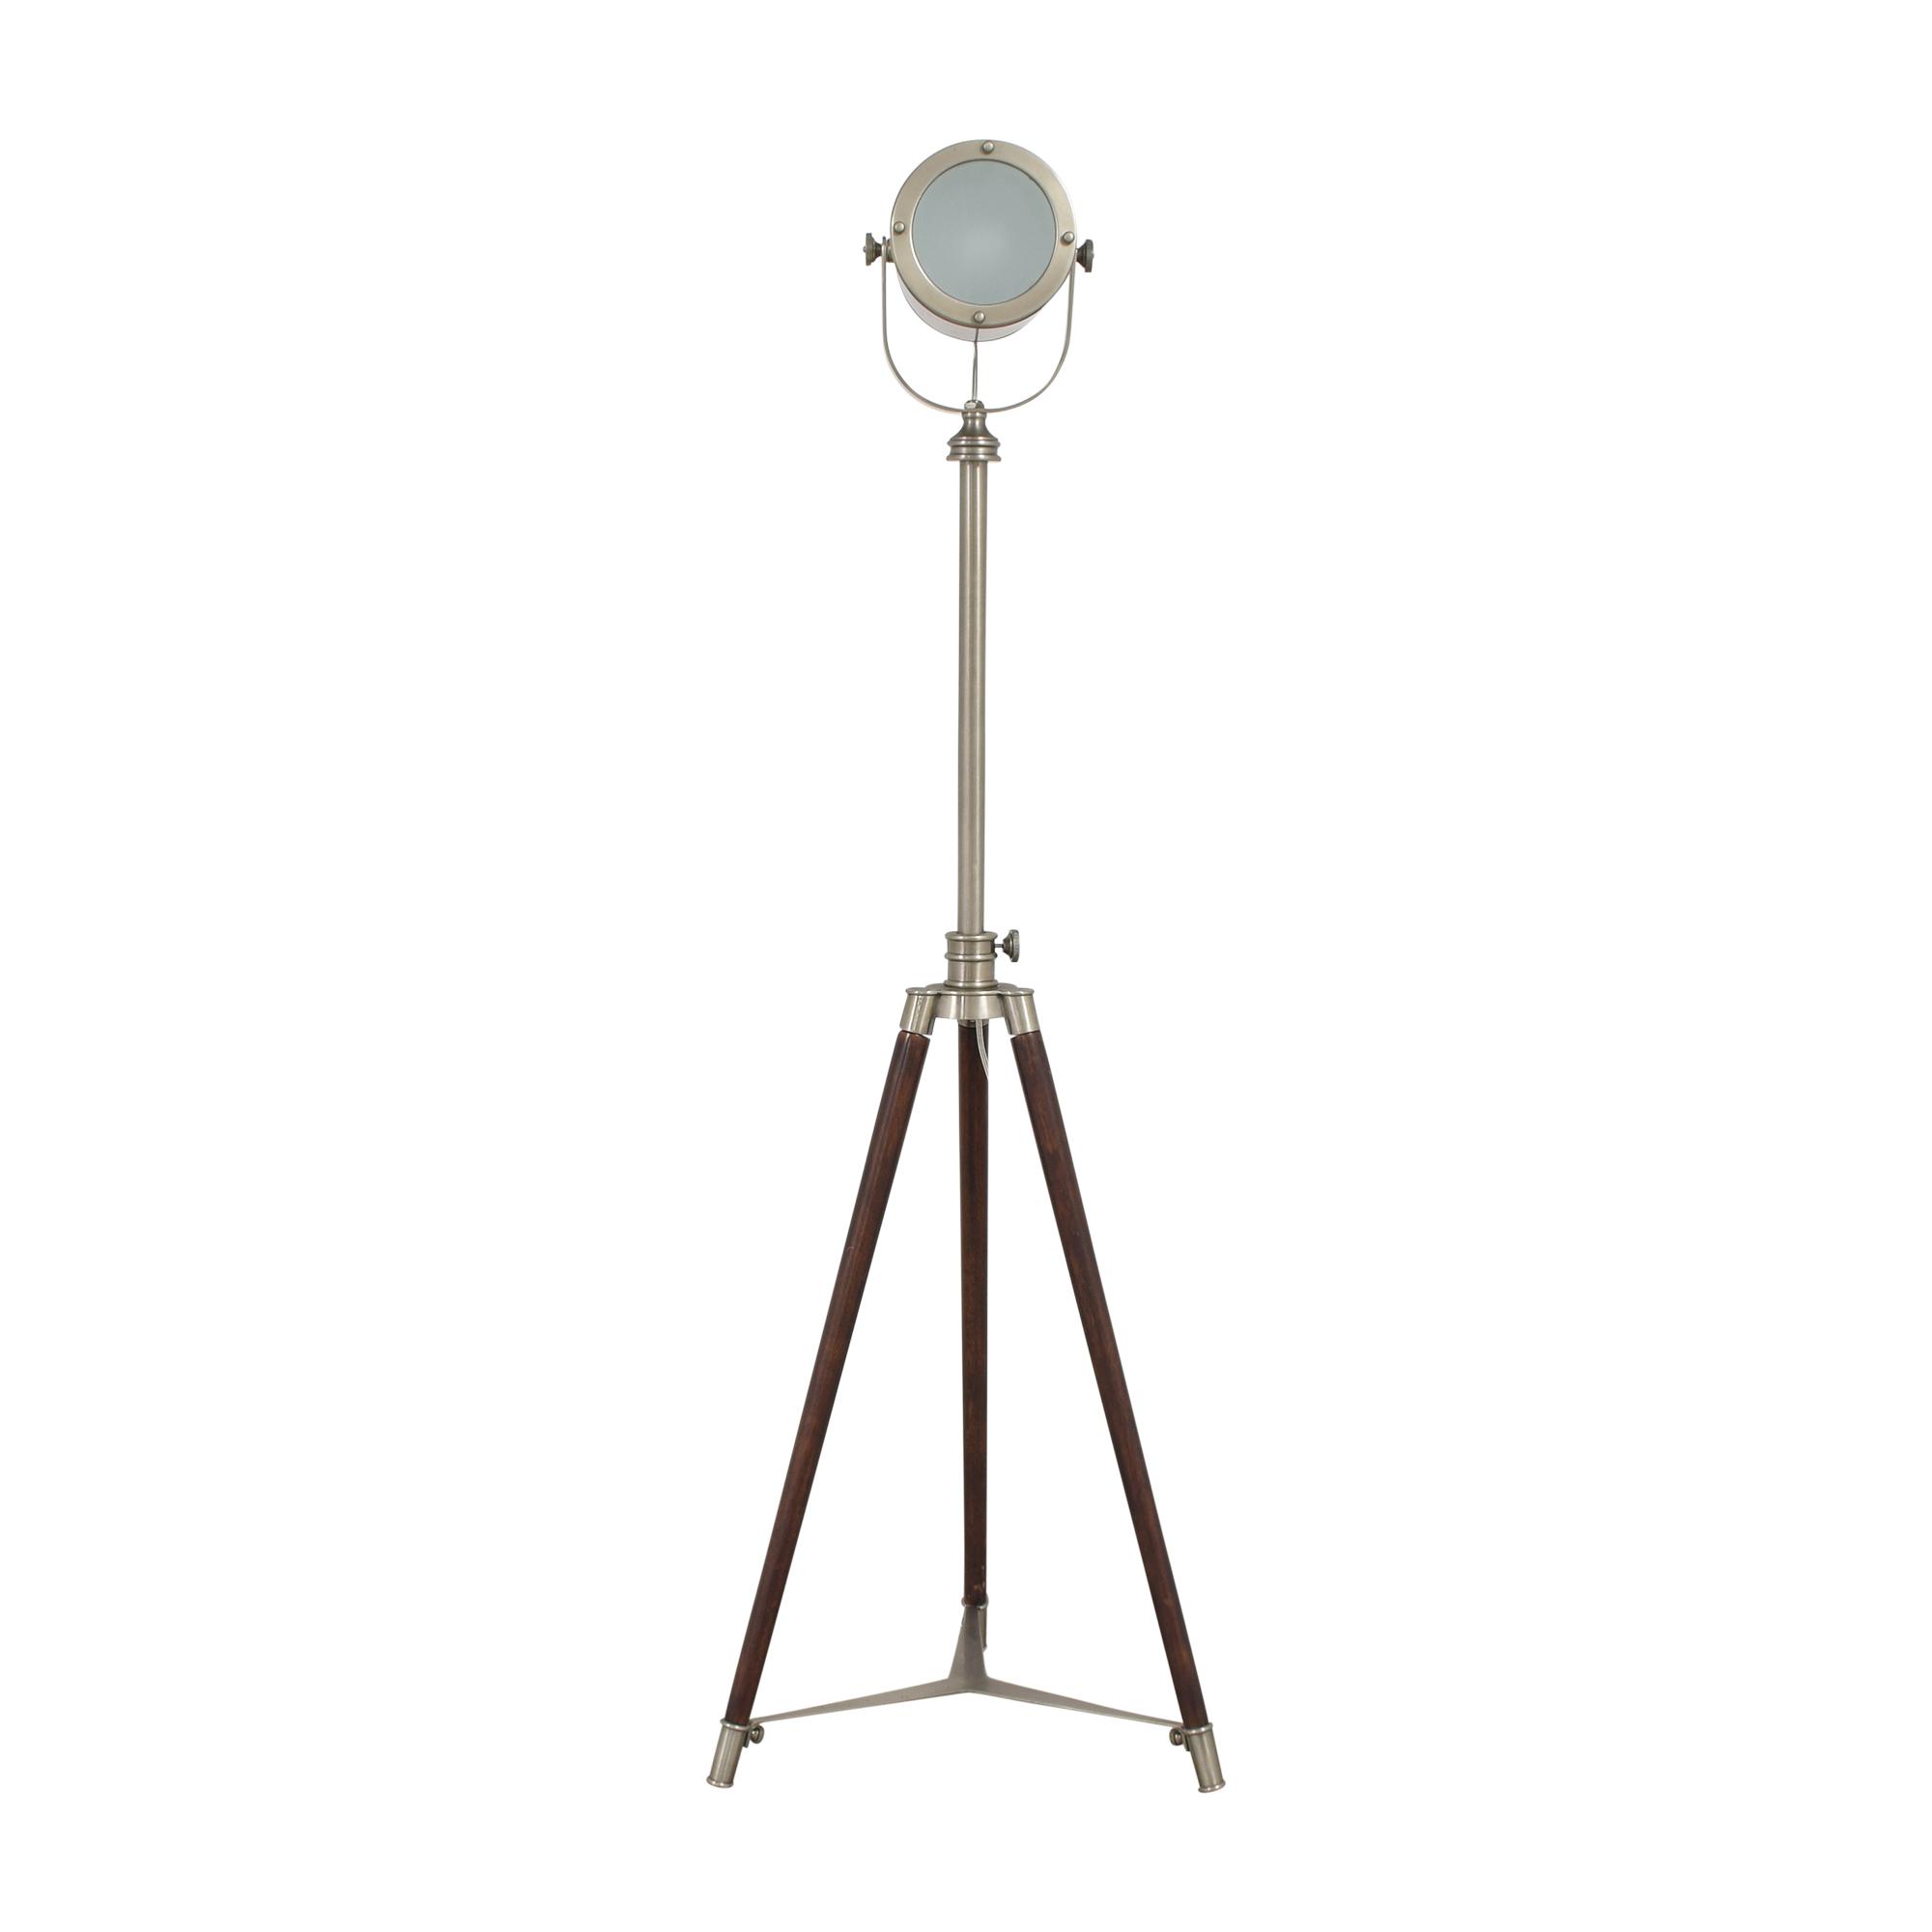 Pottery Barn Pottery Barn Photographer's Adjustable Tripod Floor Lamp pa